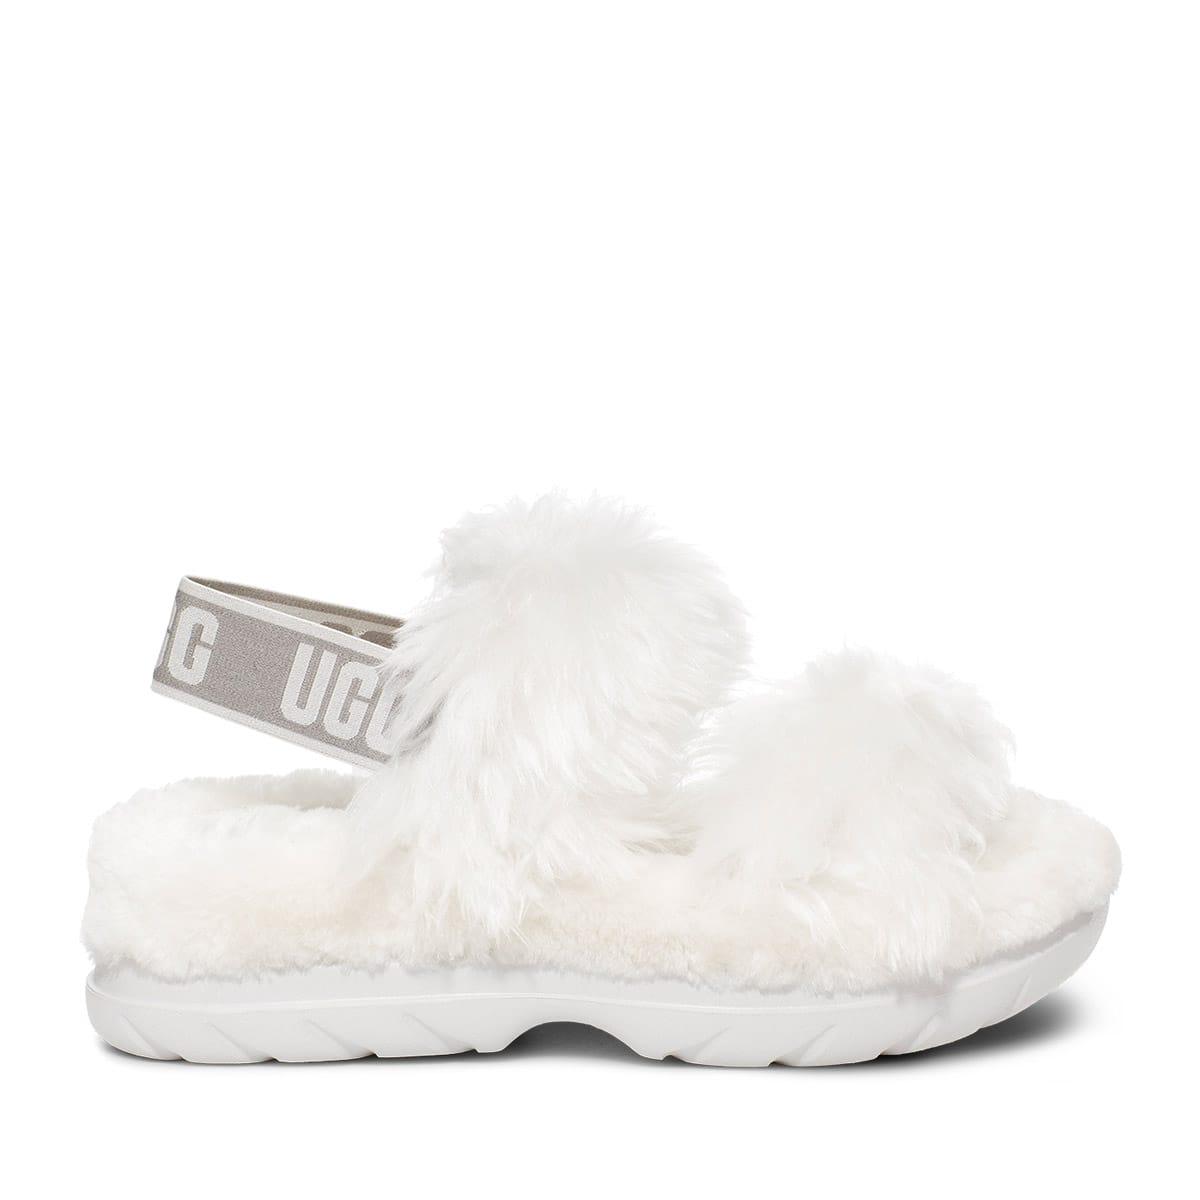 UGG Fluff Sugar Sandal WHITE 21SS-I_photo_large